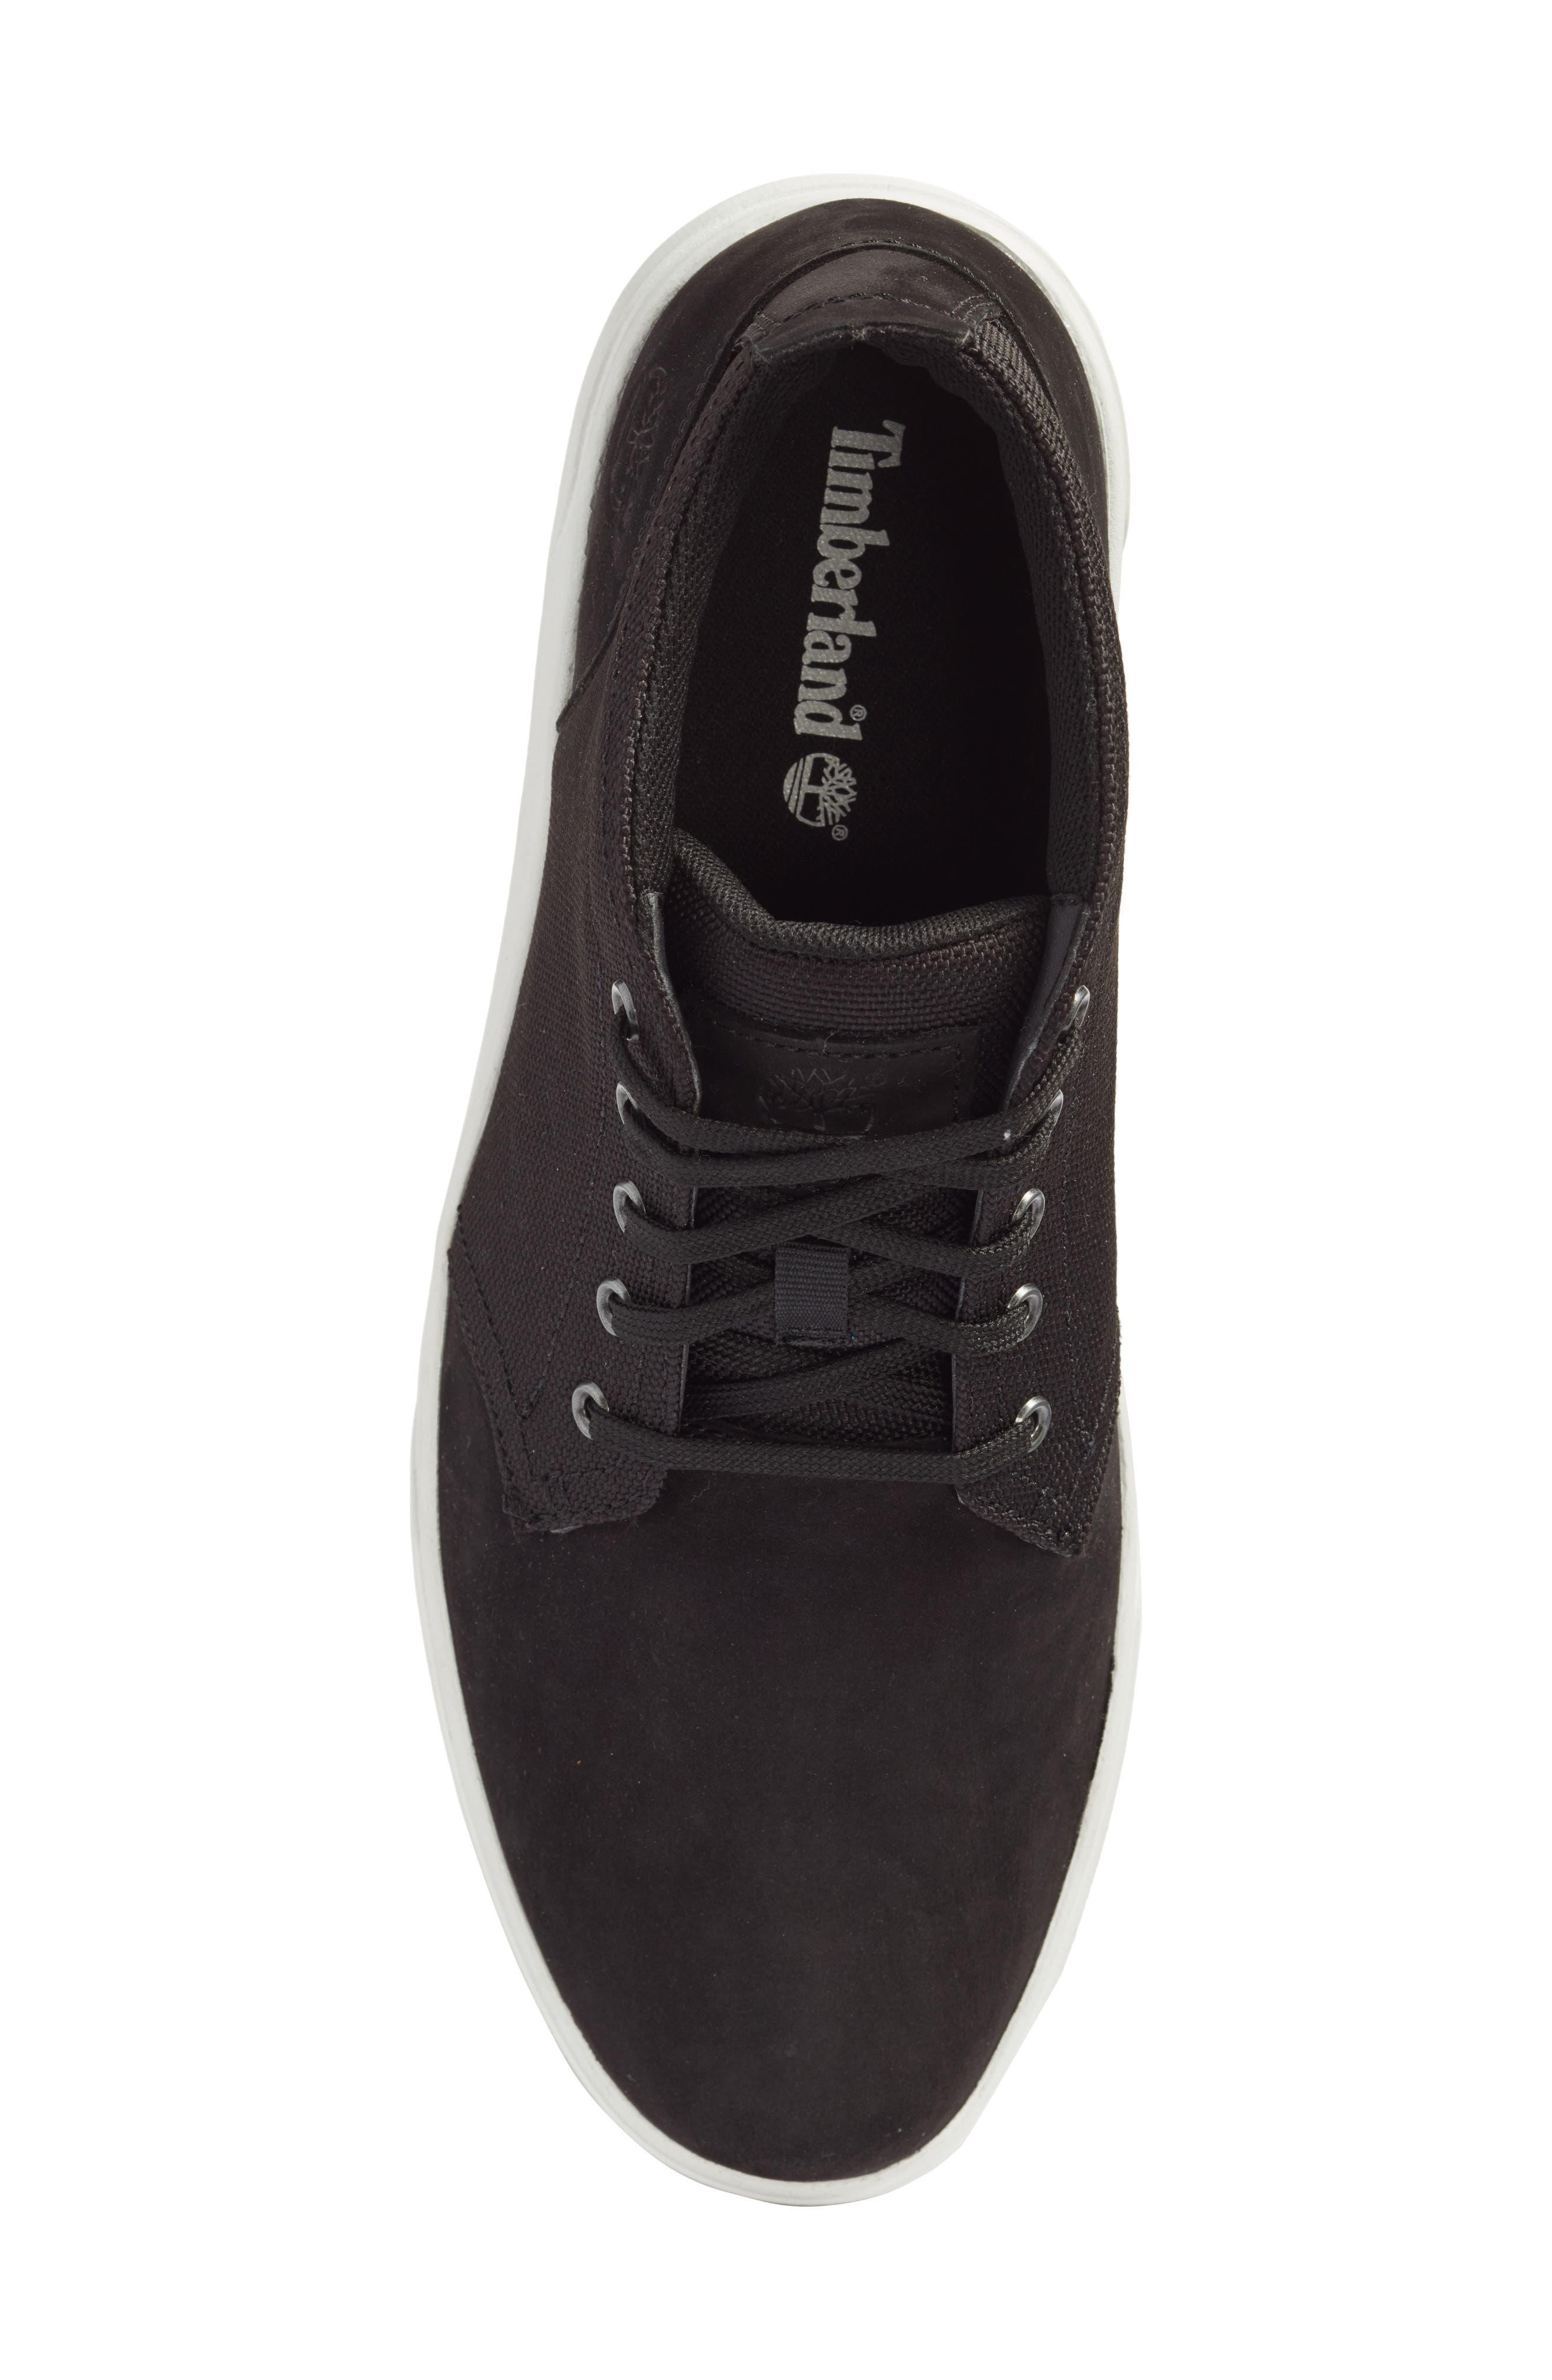 Earthkeepers<sup>™</sup> 'Groveton' Chukka Sneaker,                             Alternate thumbnail 5, color,                             Black Nubuck/ Canvas